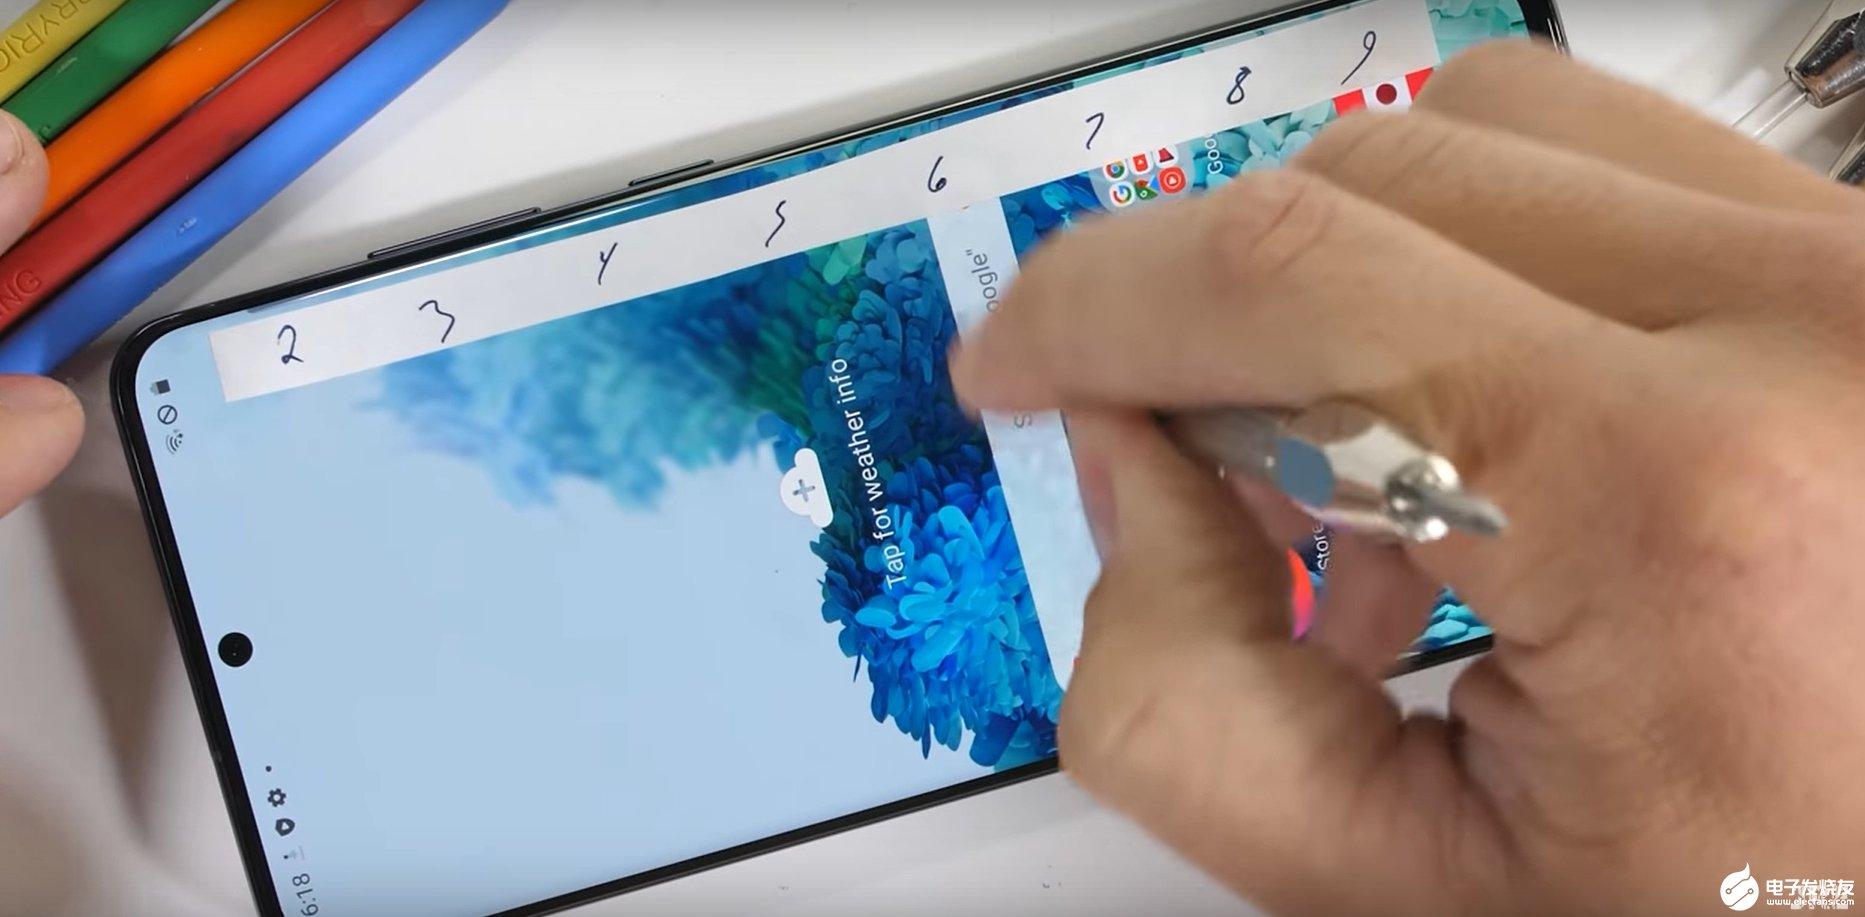 SAMSUNGGalaxy S20 Ultra:显示屏硬度大概在6级,整体坚固耐用